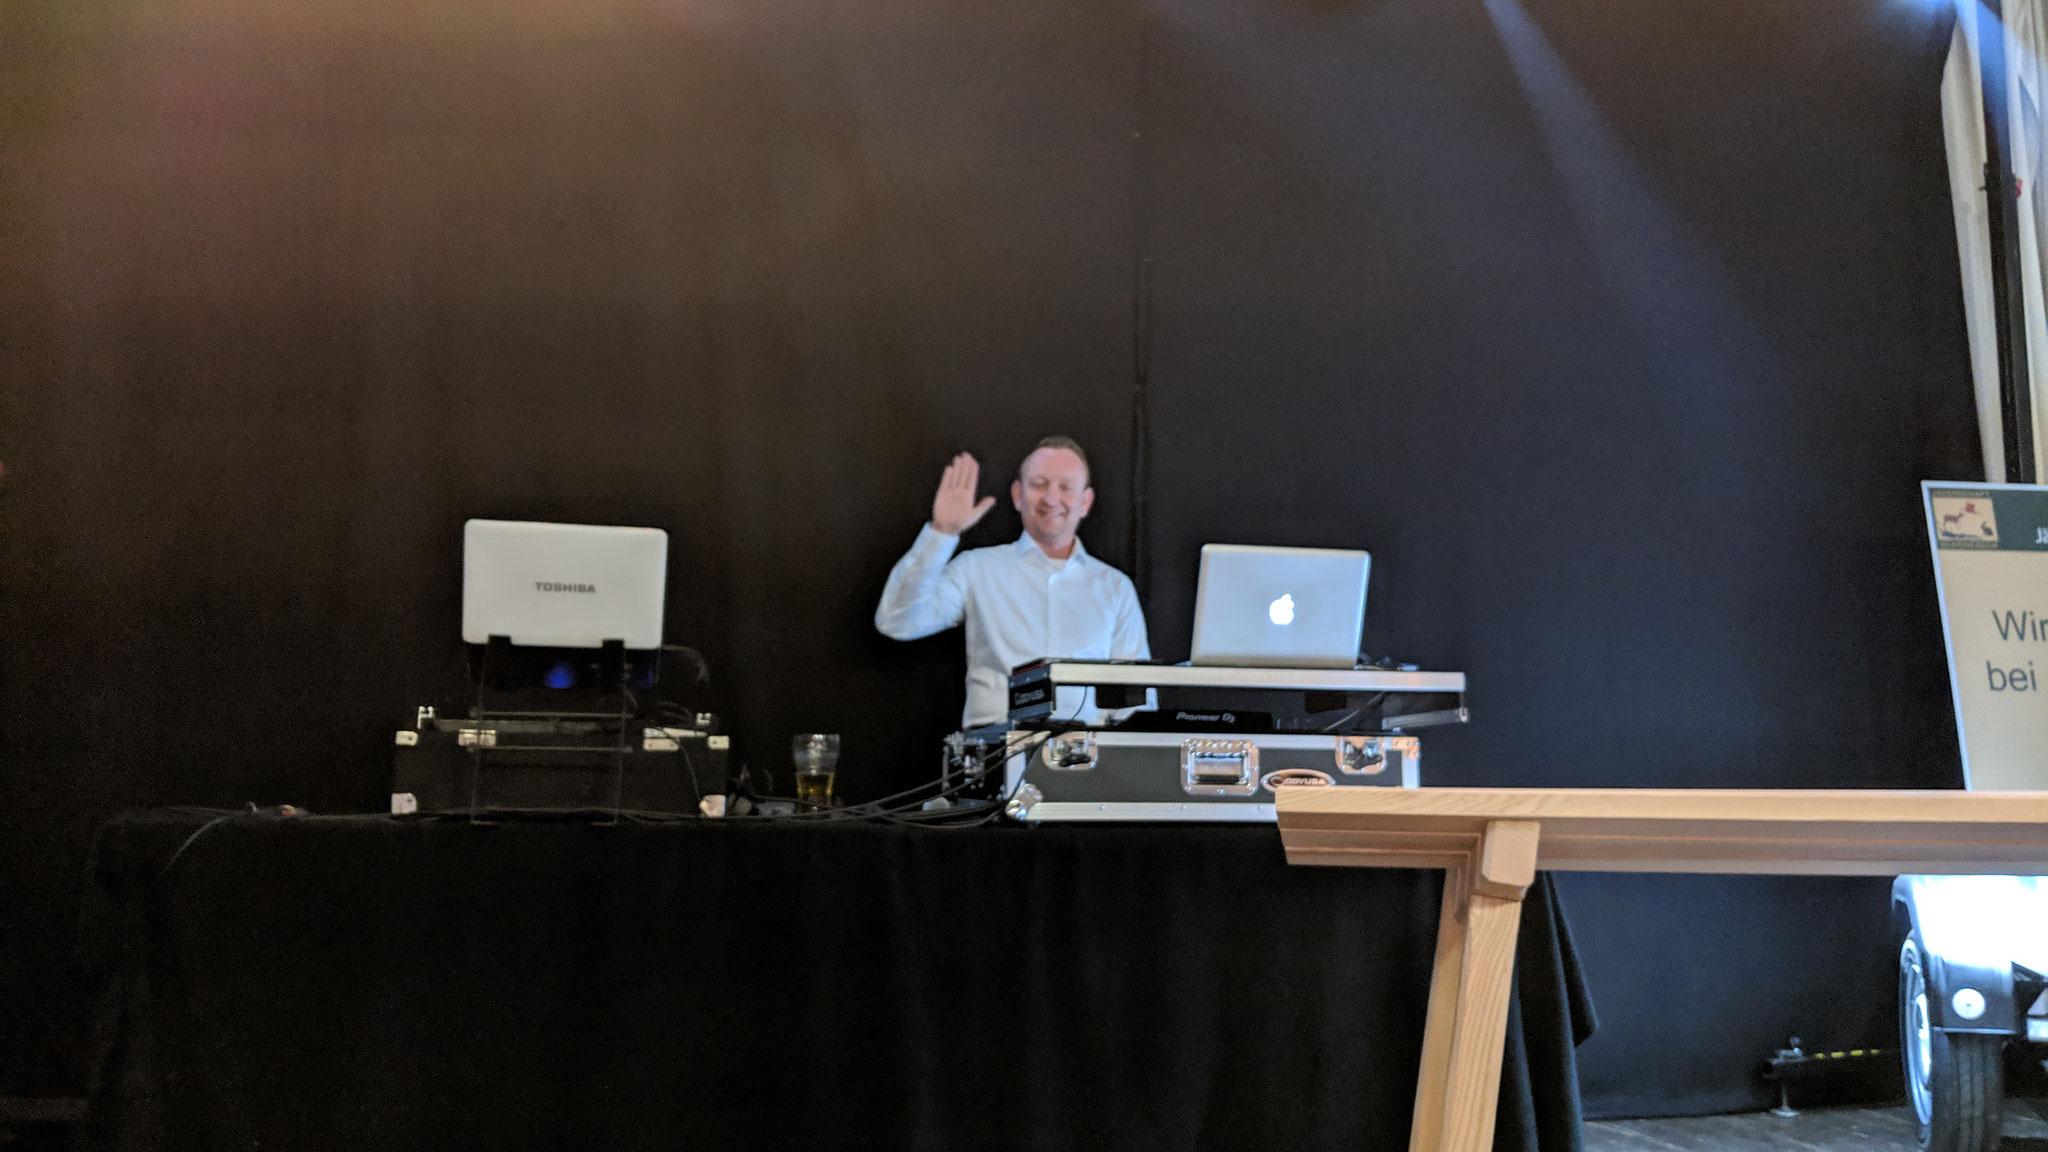 Gruß an unsere DJ Enrico.